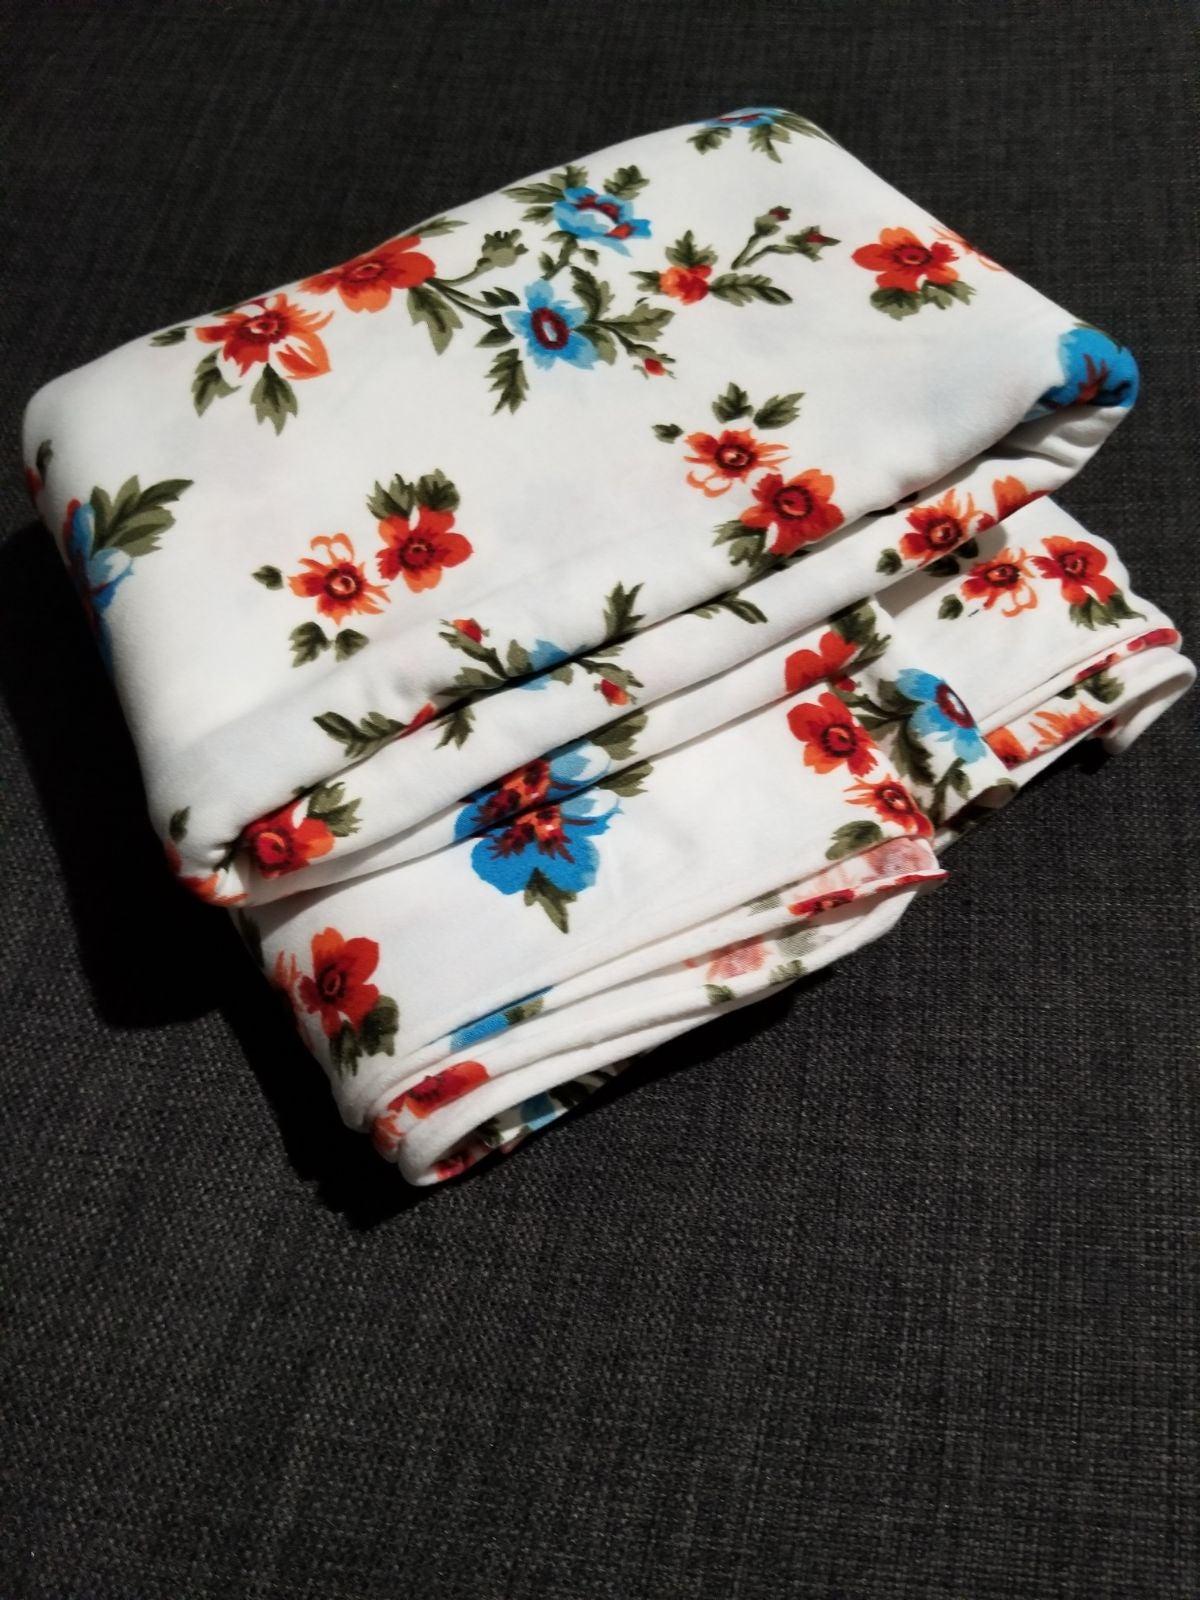 Apparel knit fabric